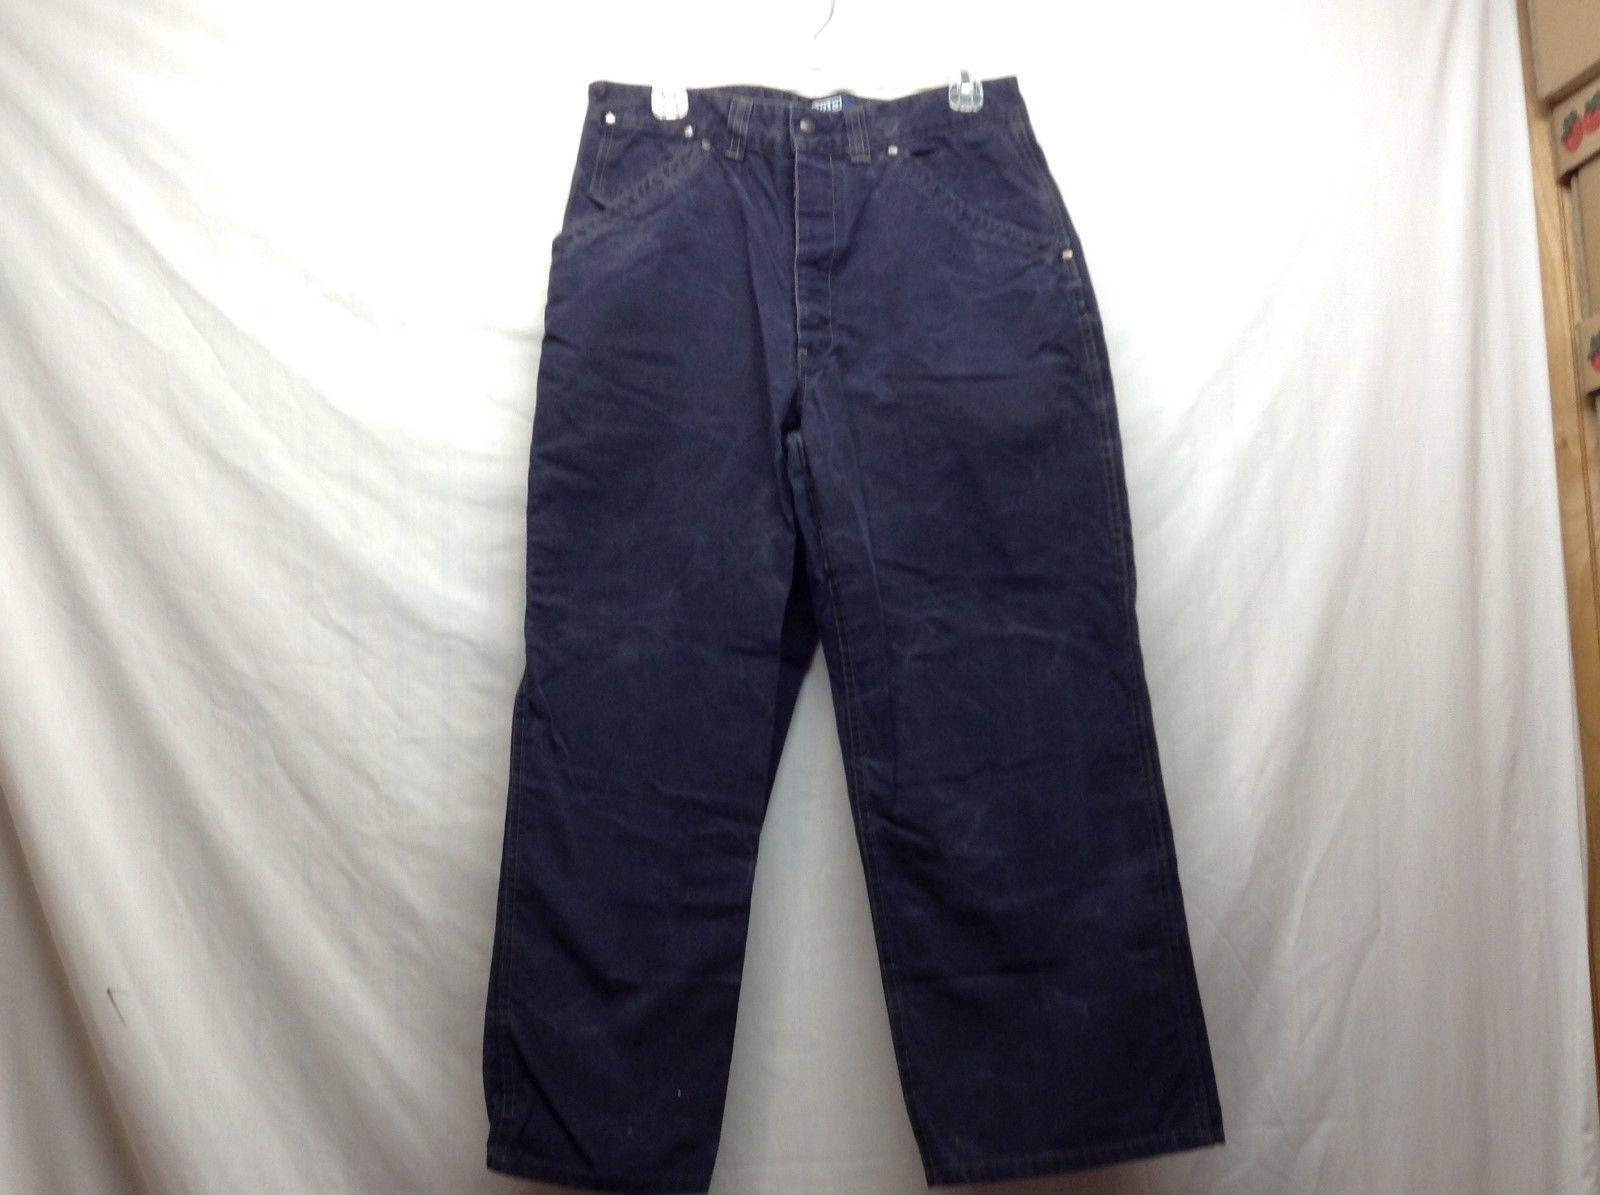 POLO by Ralph Lauren Dark Grey Cotton Jeans Sz 32